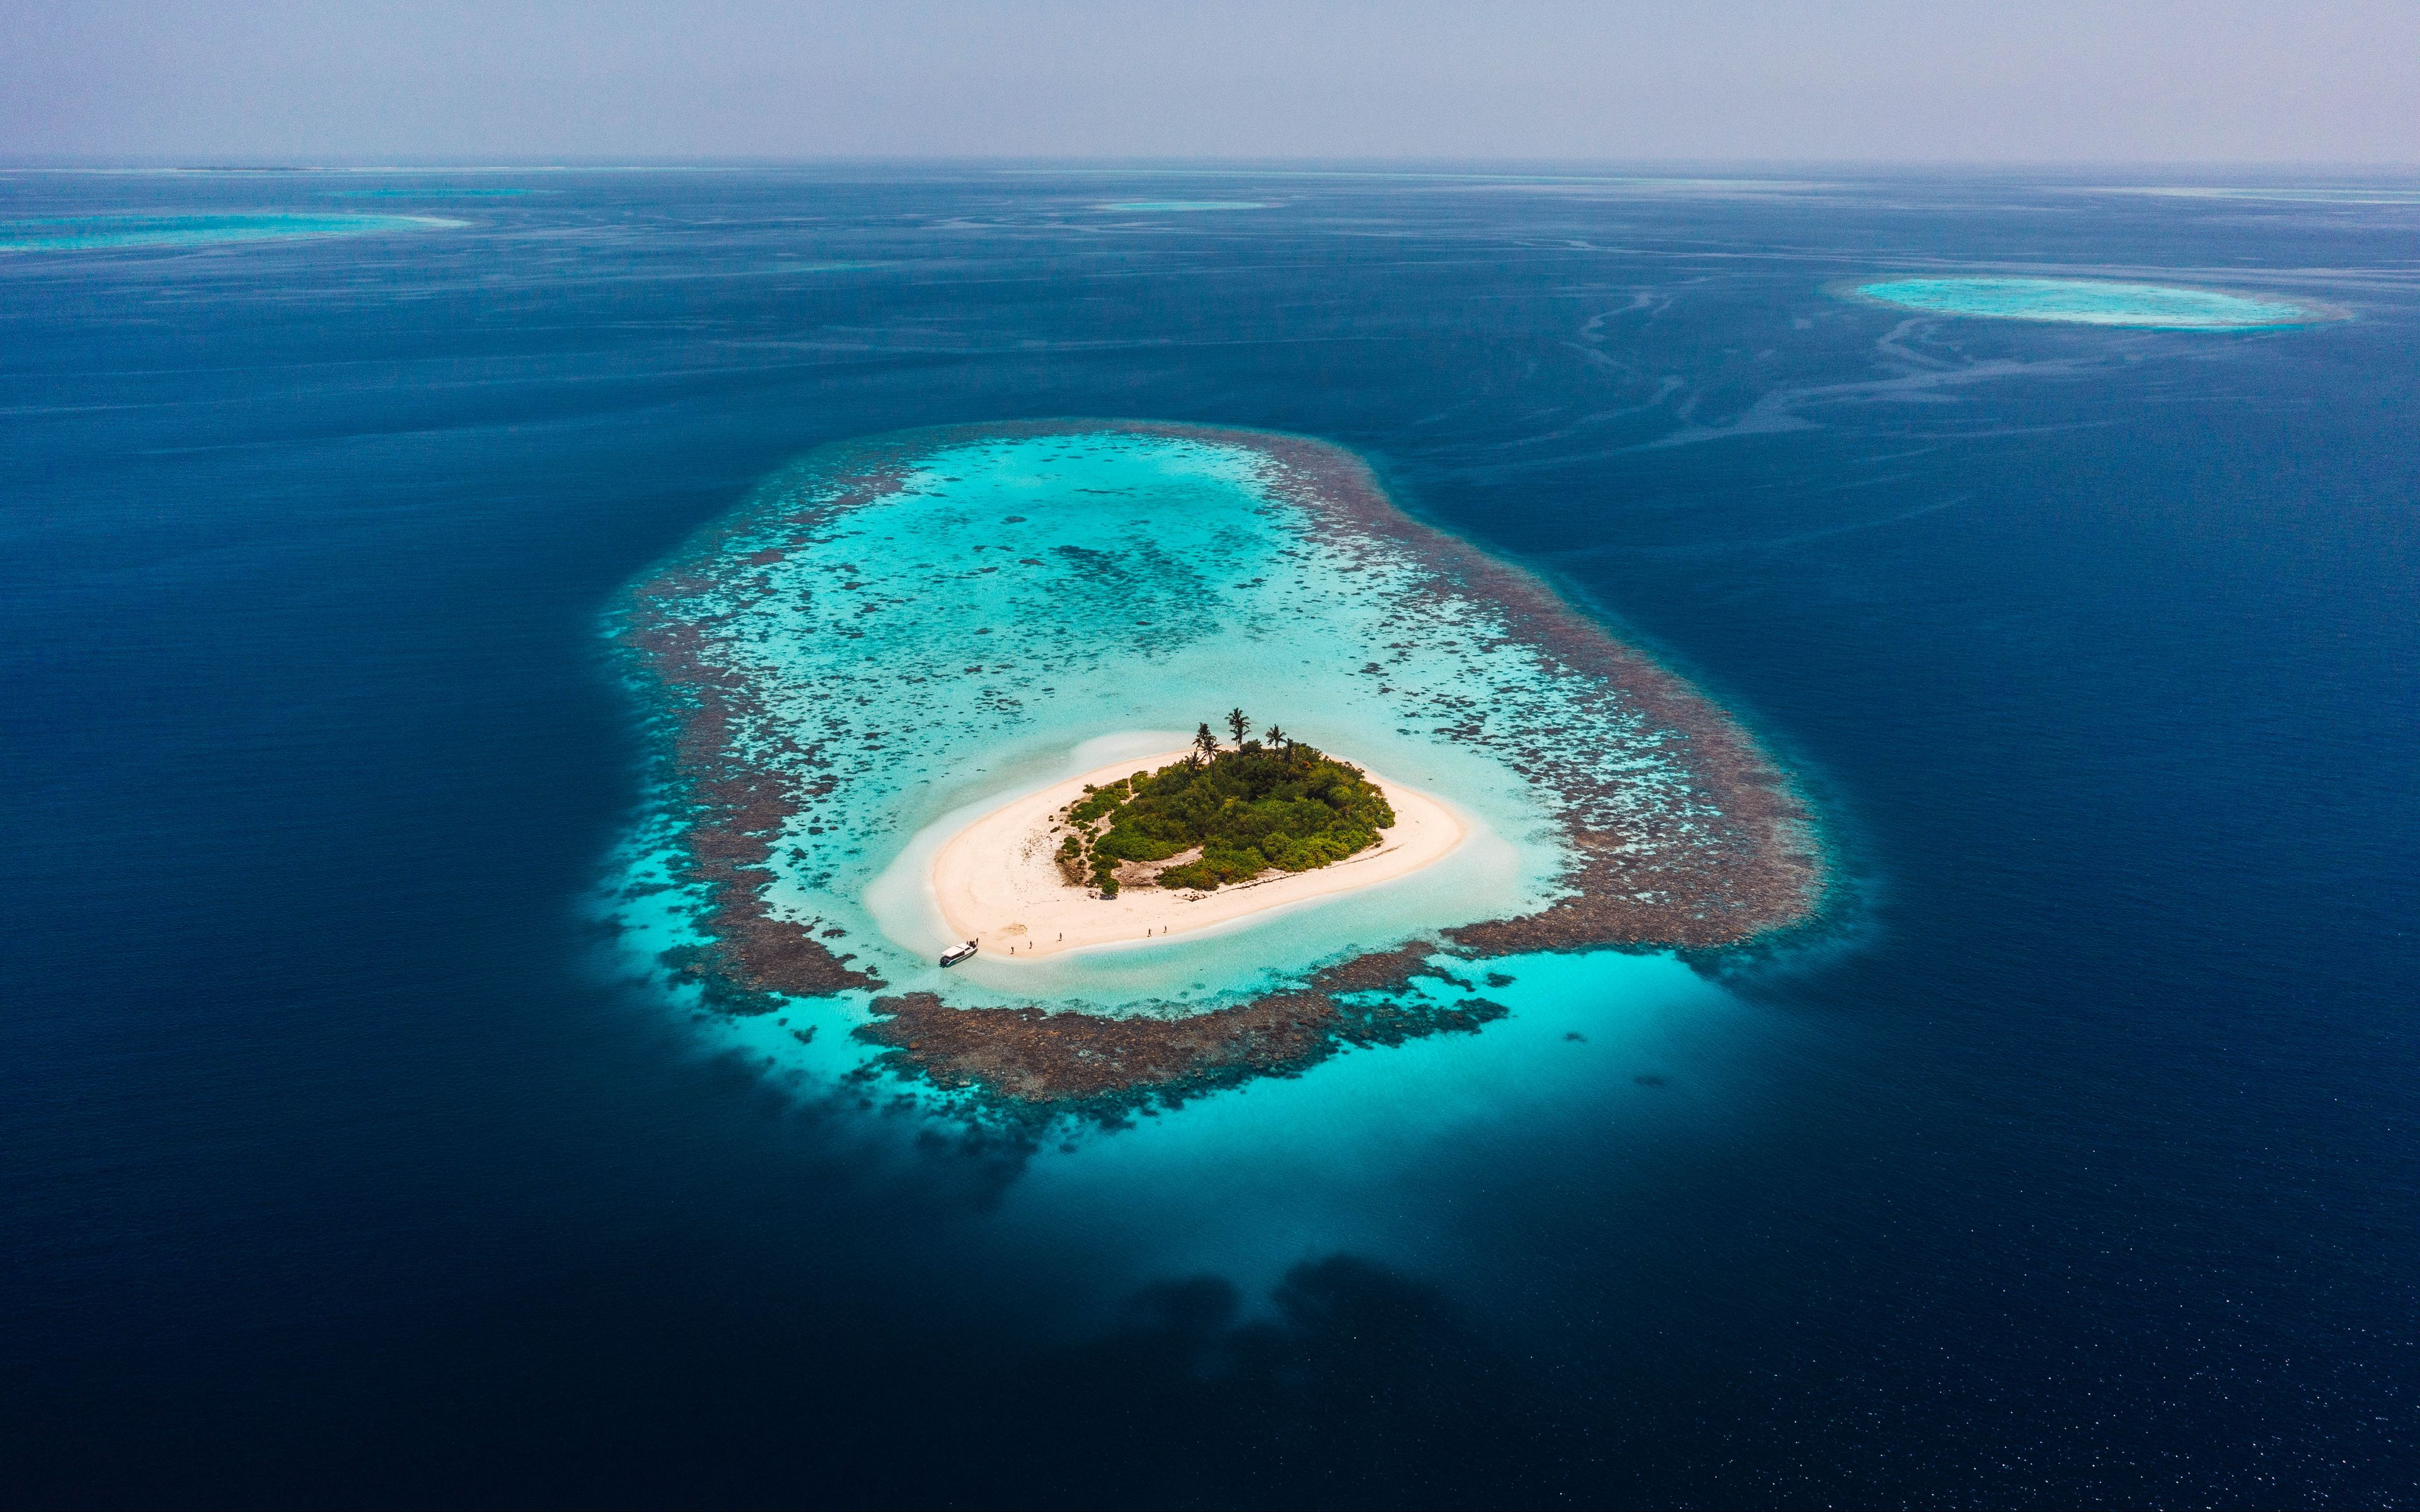 Download wallpaper 3840x2400 island ocean aerial view water 3840x2400